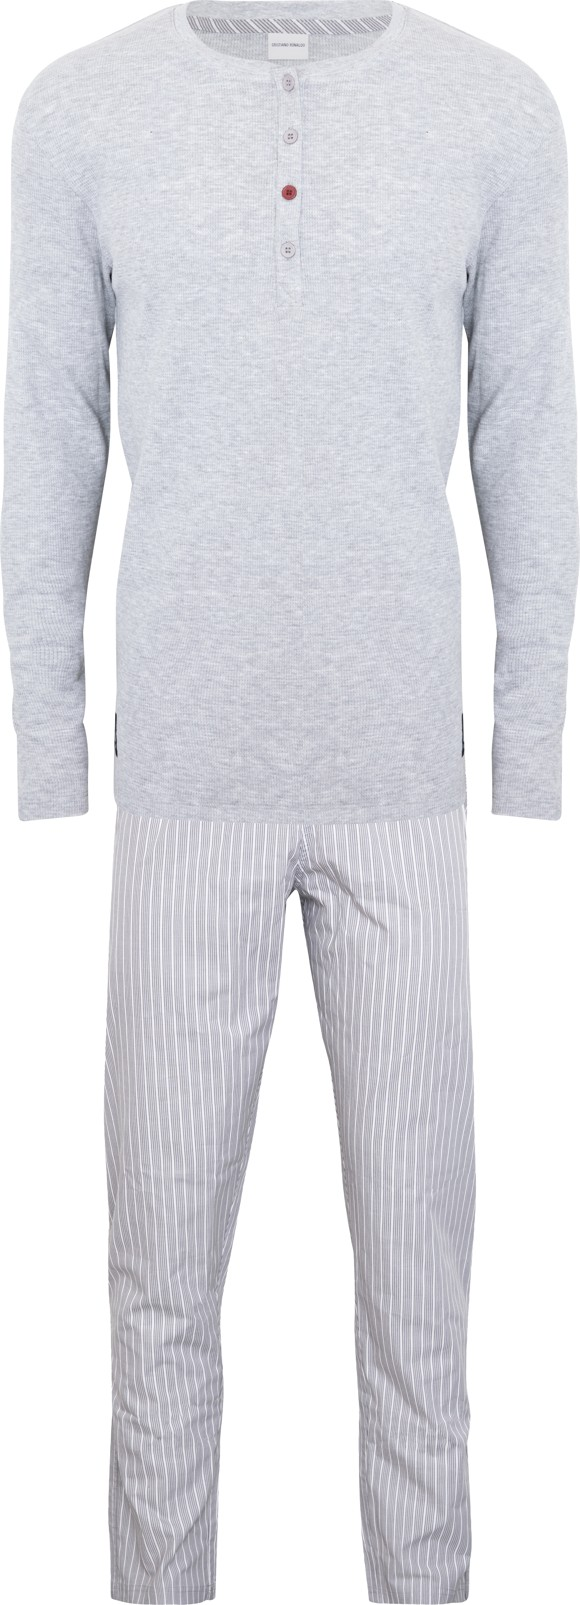 CR7  - Mens Pyjamas Set- Grey